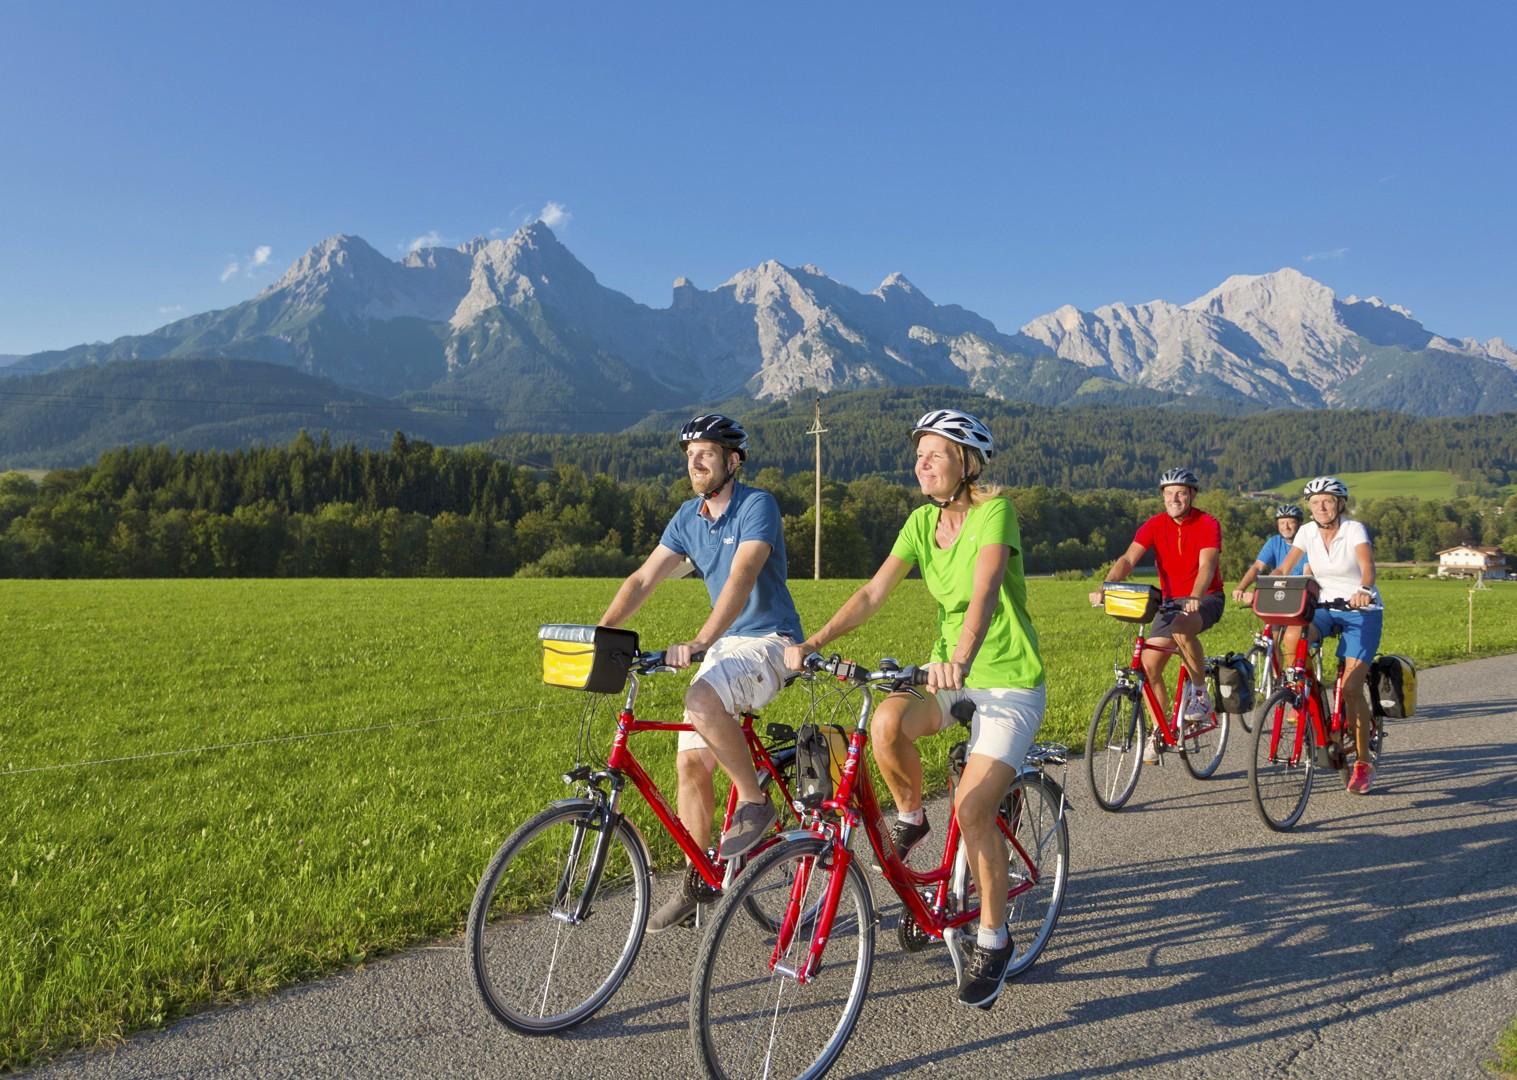 austria-panoramic-mountain-views-leisure-bike-holiday.jpg - NEW! Austria - Tauern Valleys - Leisure Cycling